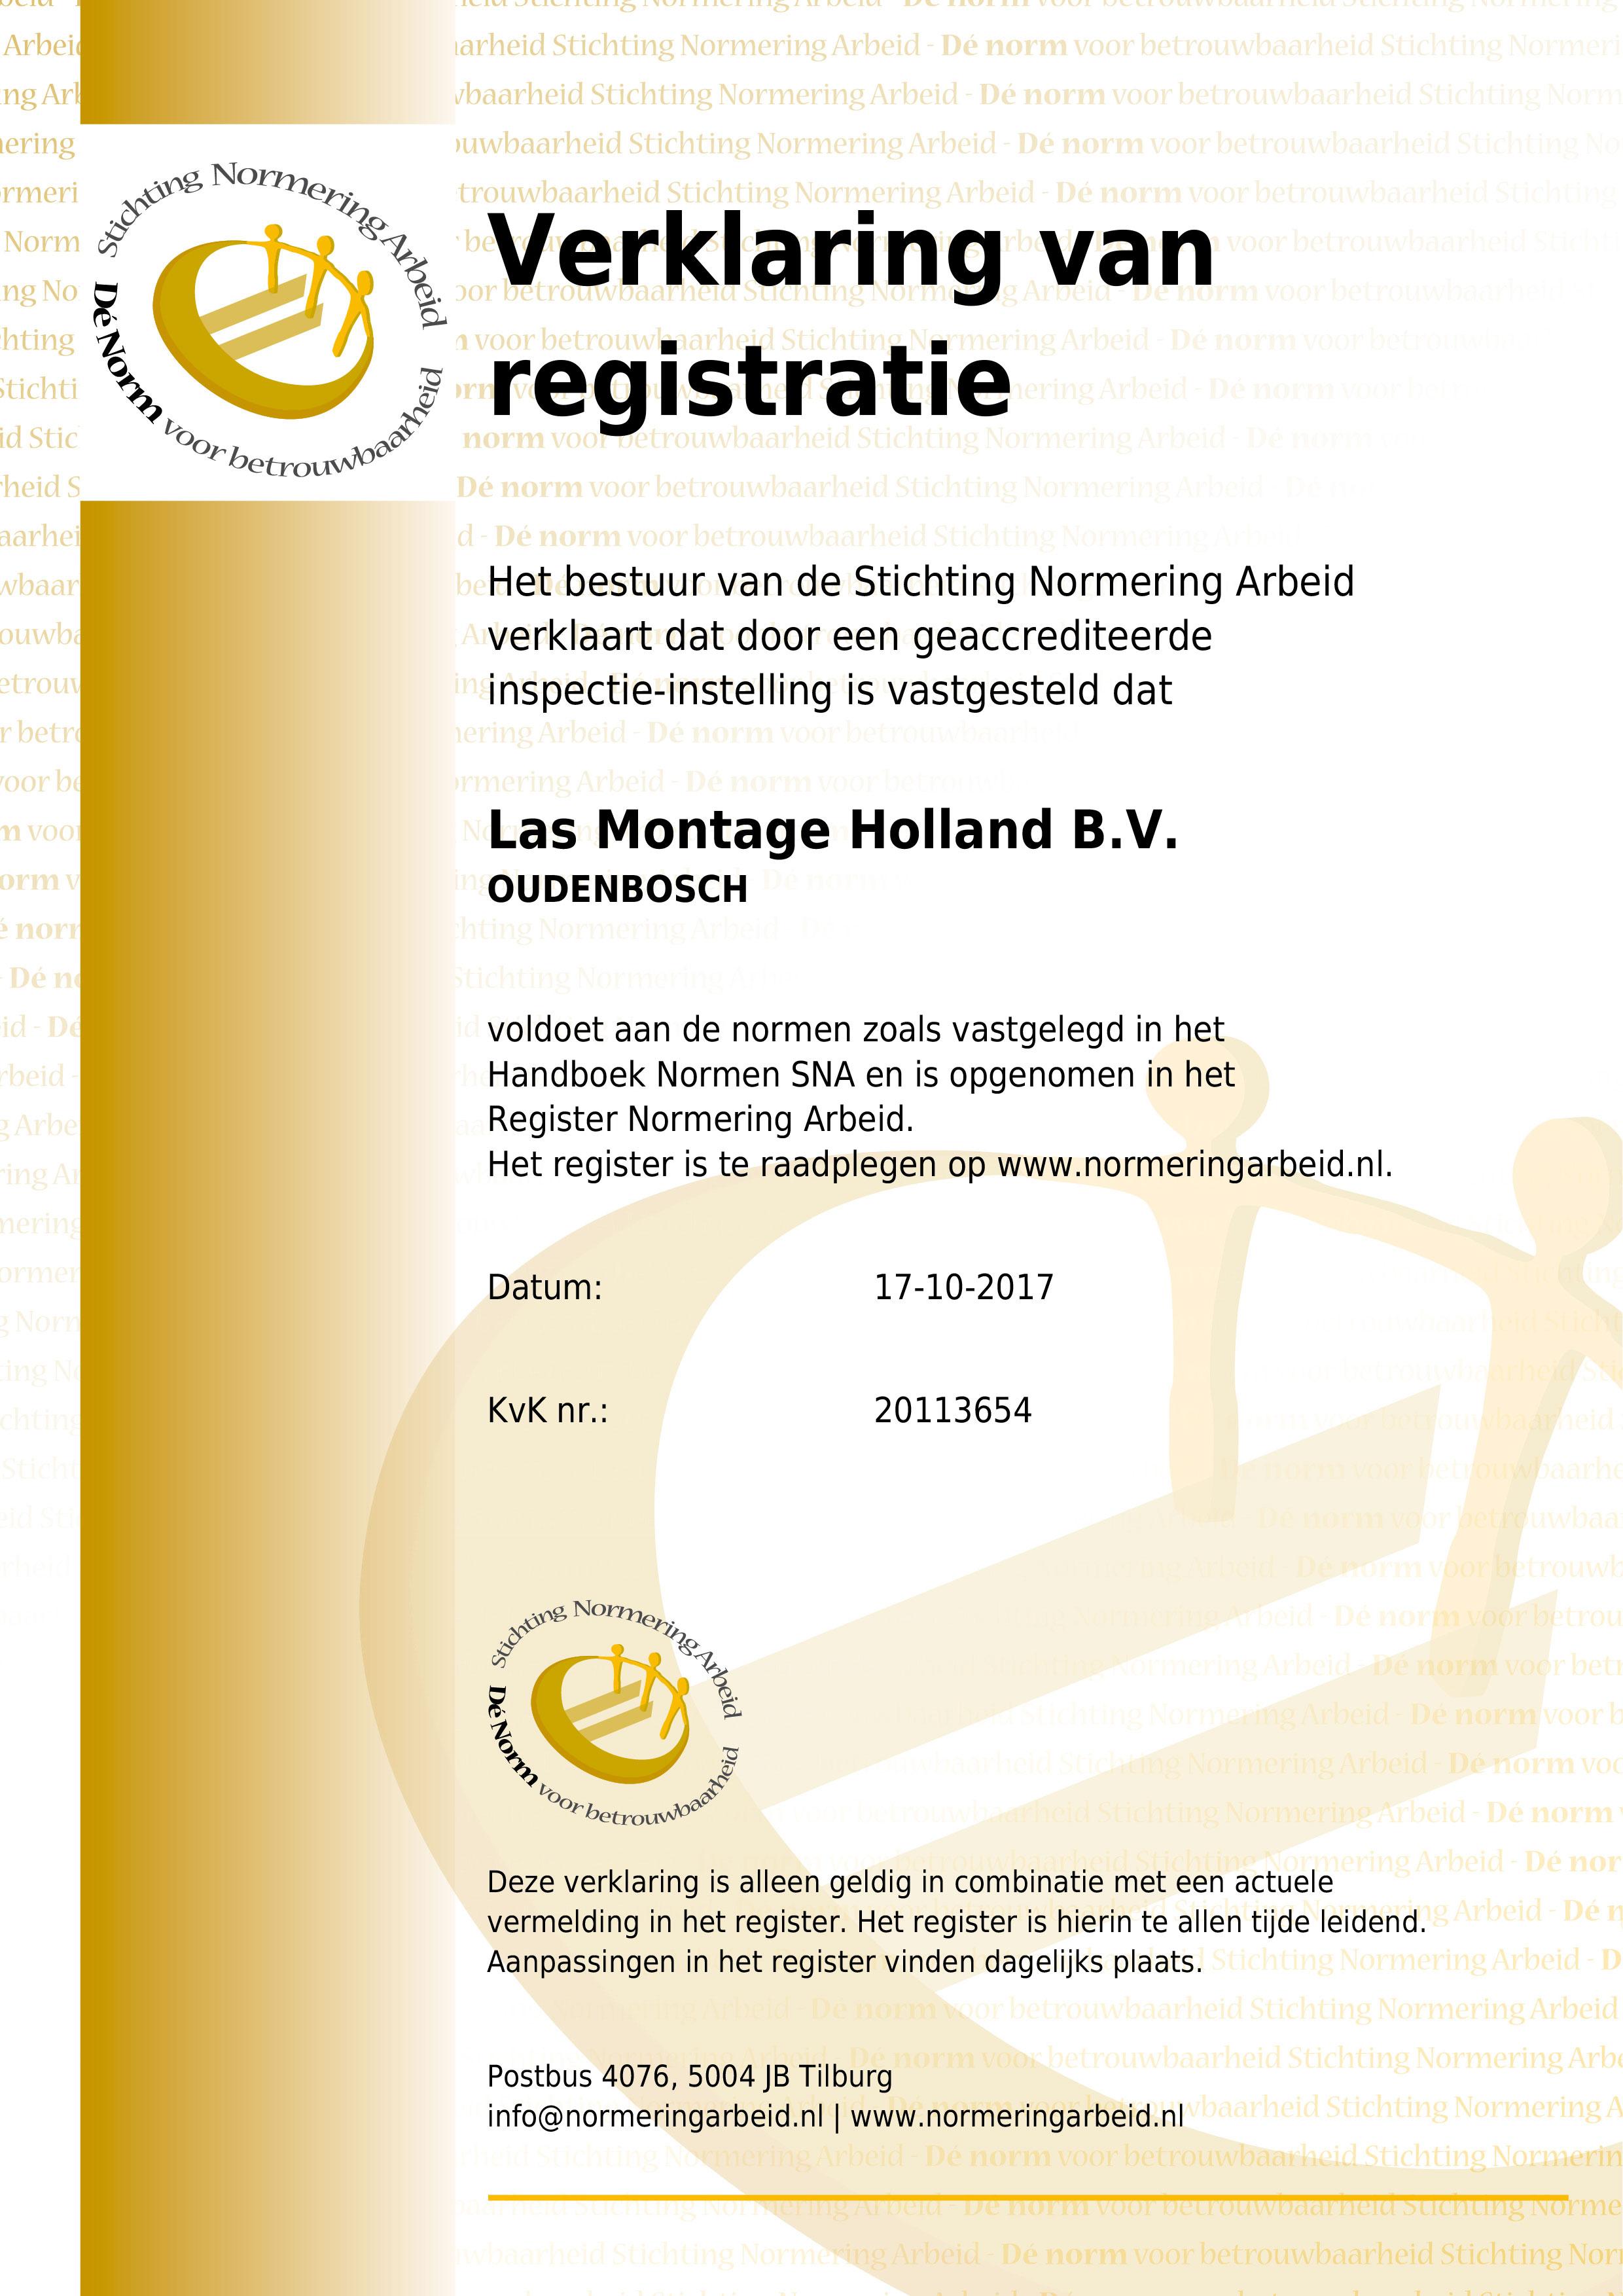 LMH-BV-NEN-4400-1